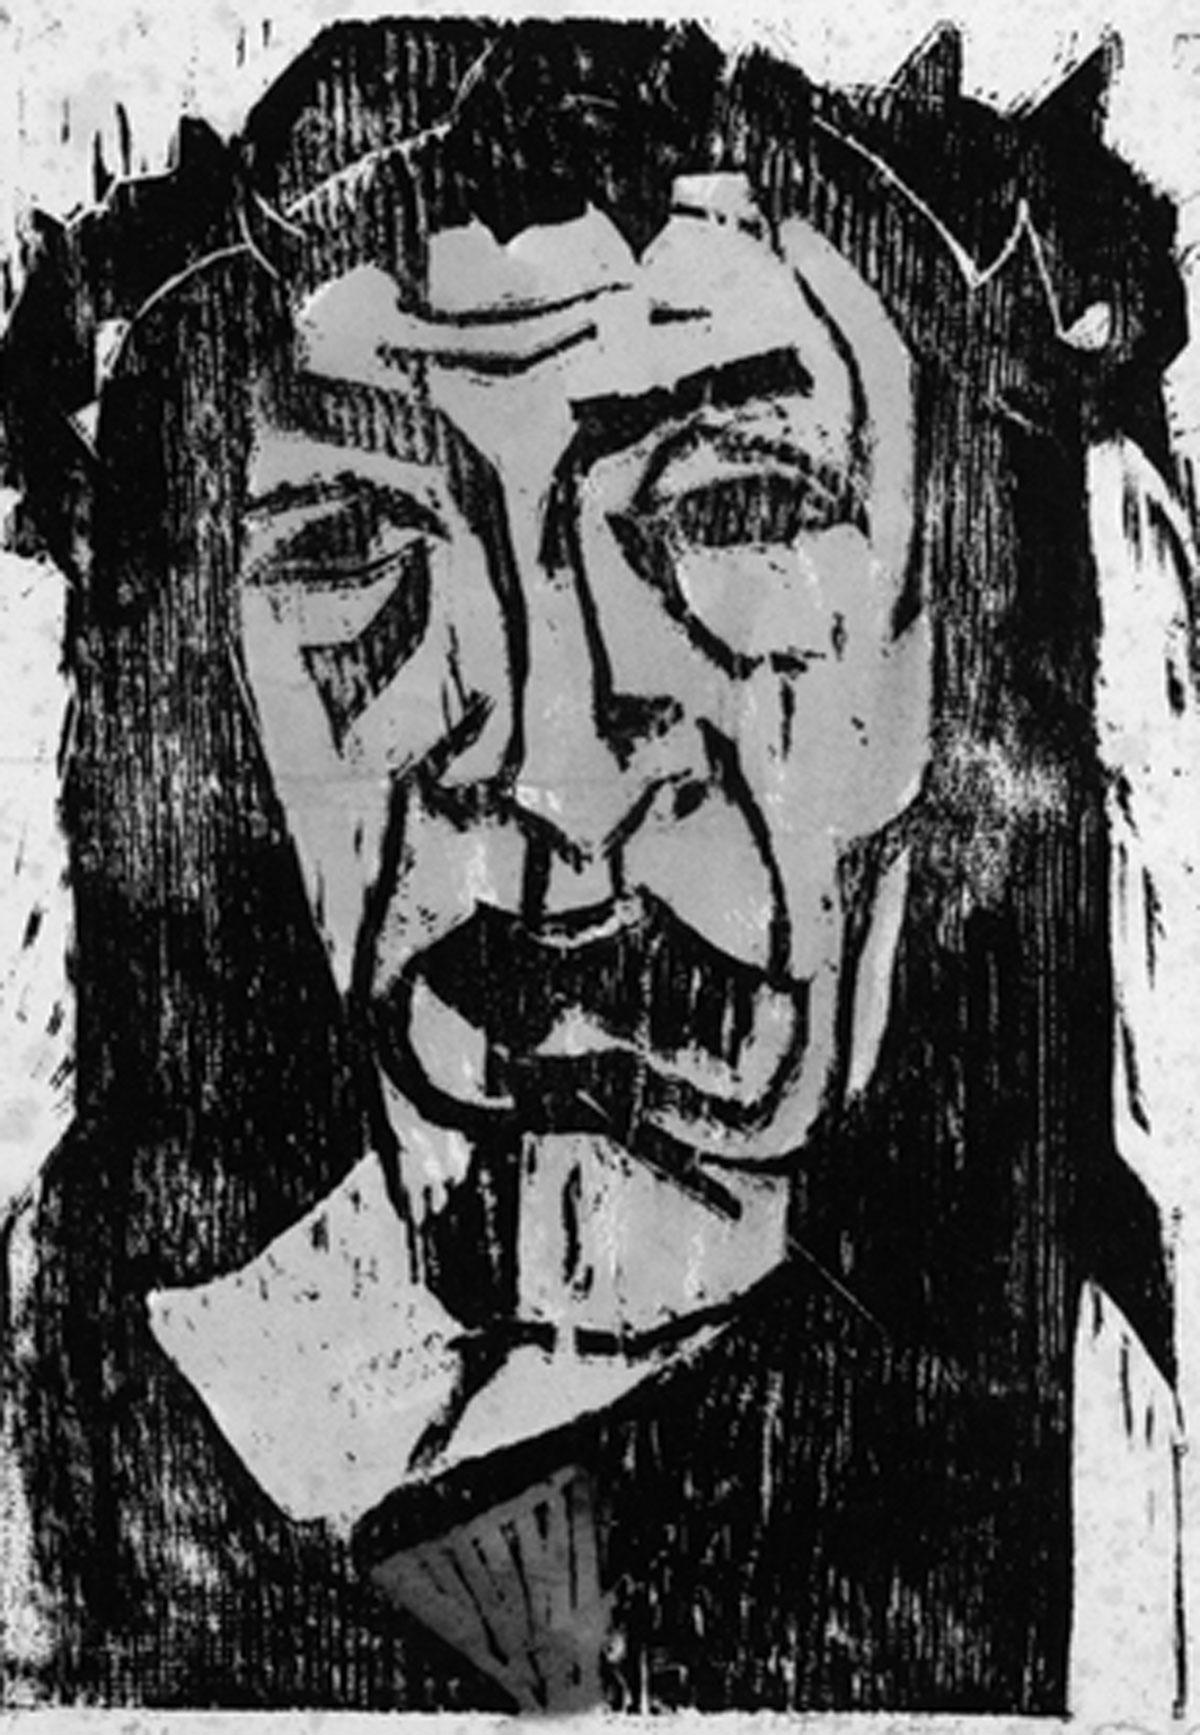 Heinz Tetzner, Gequält, 1953